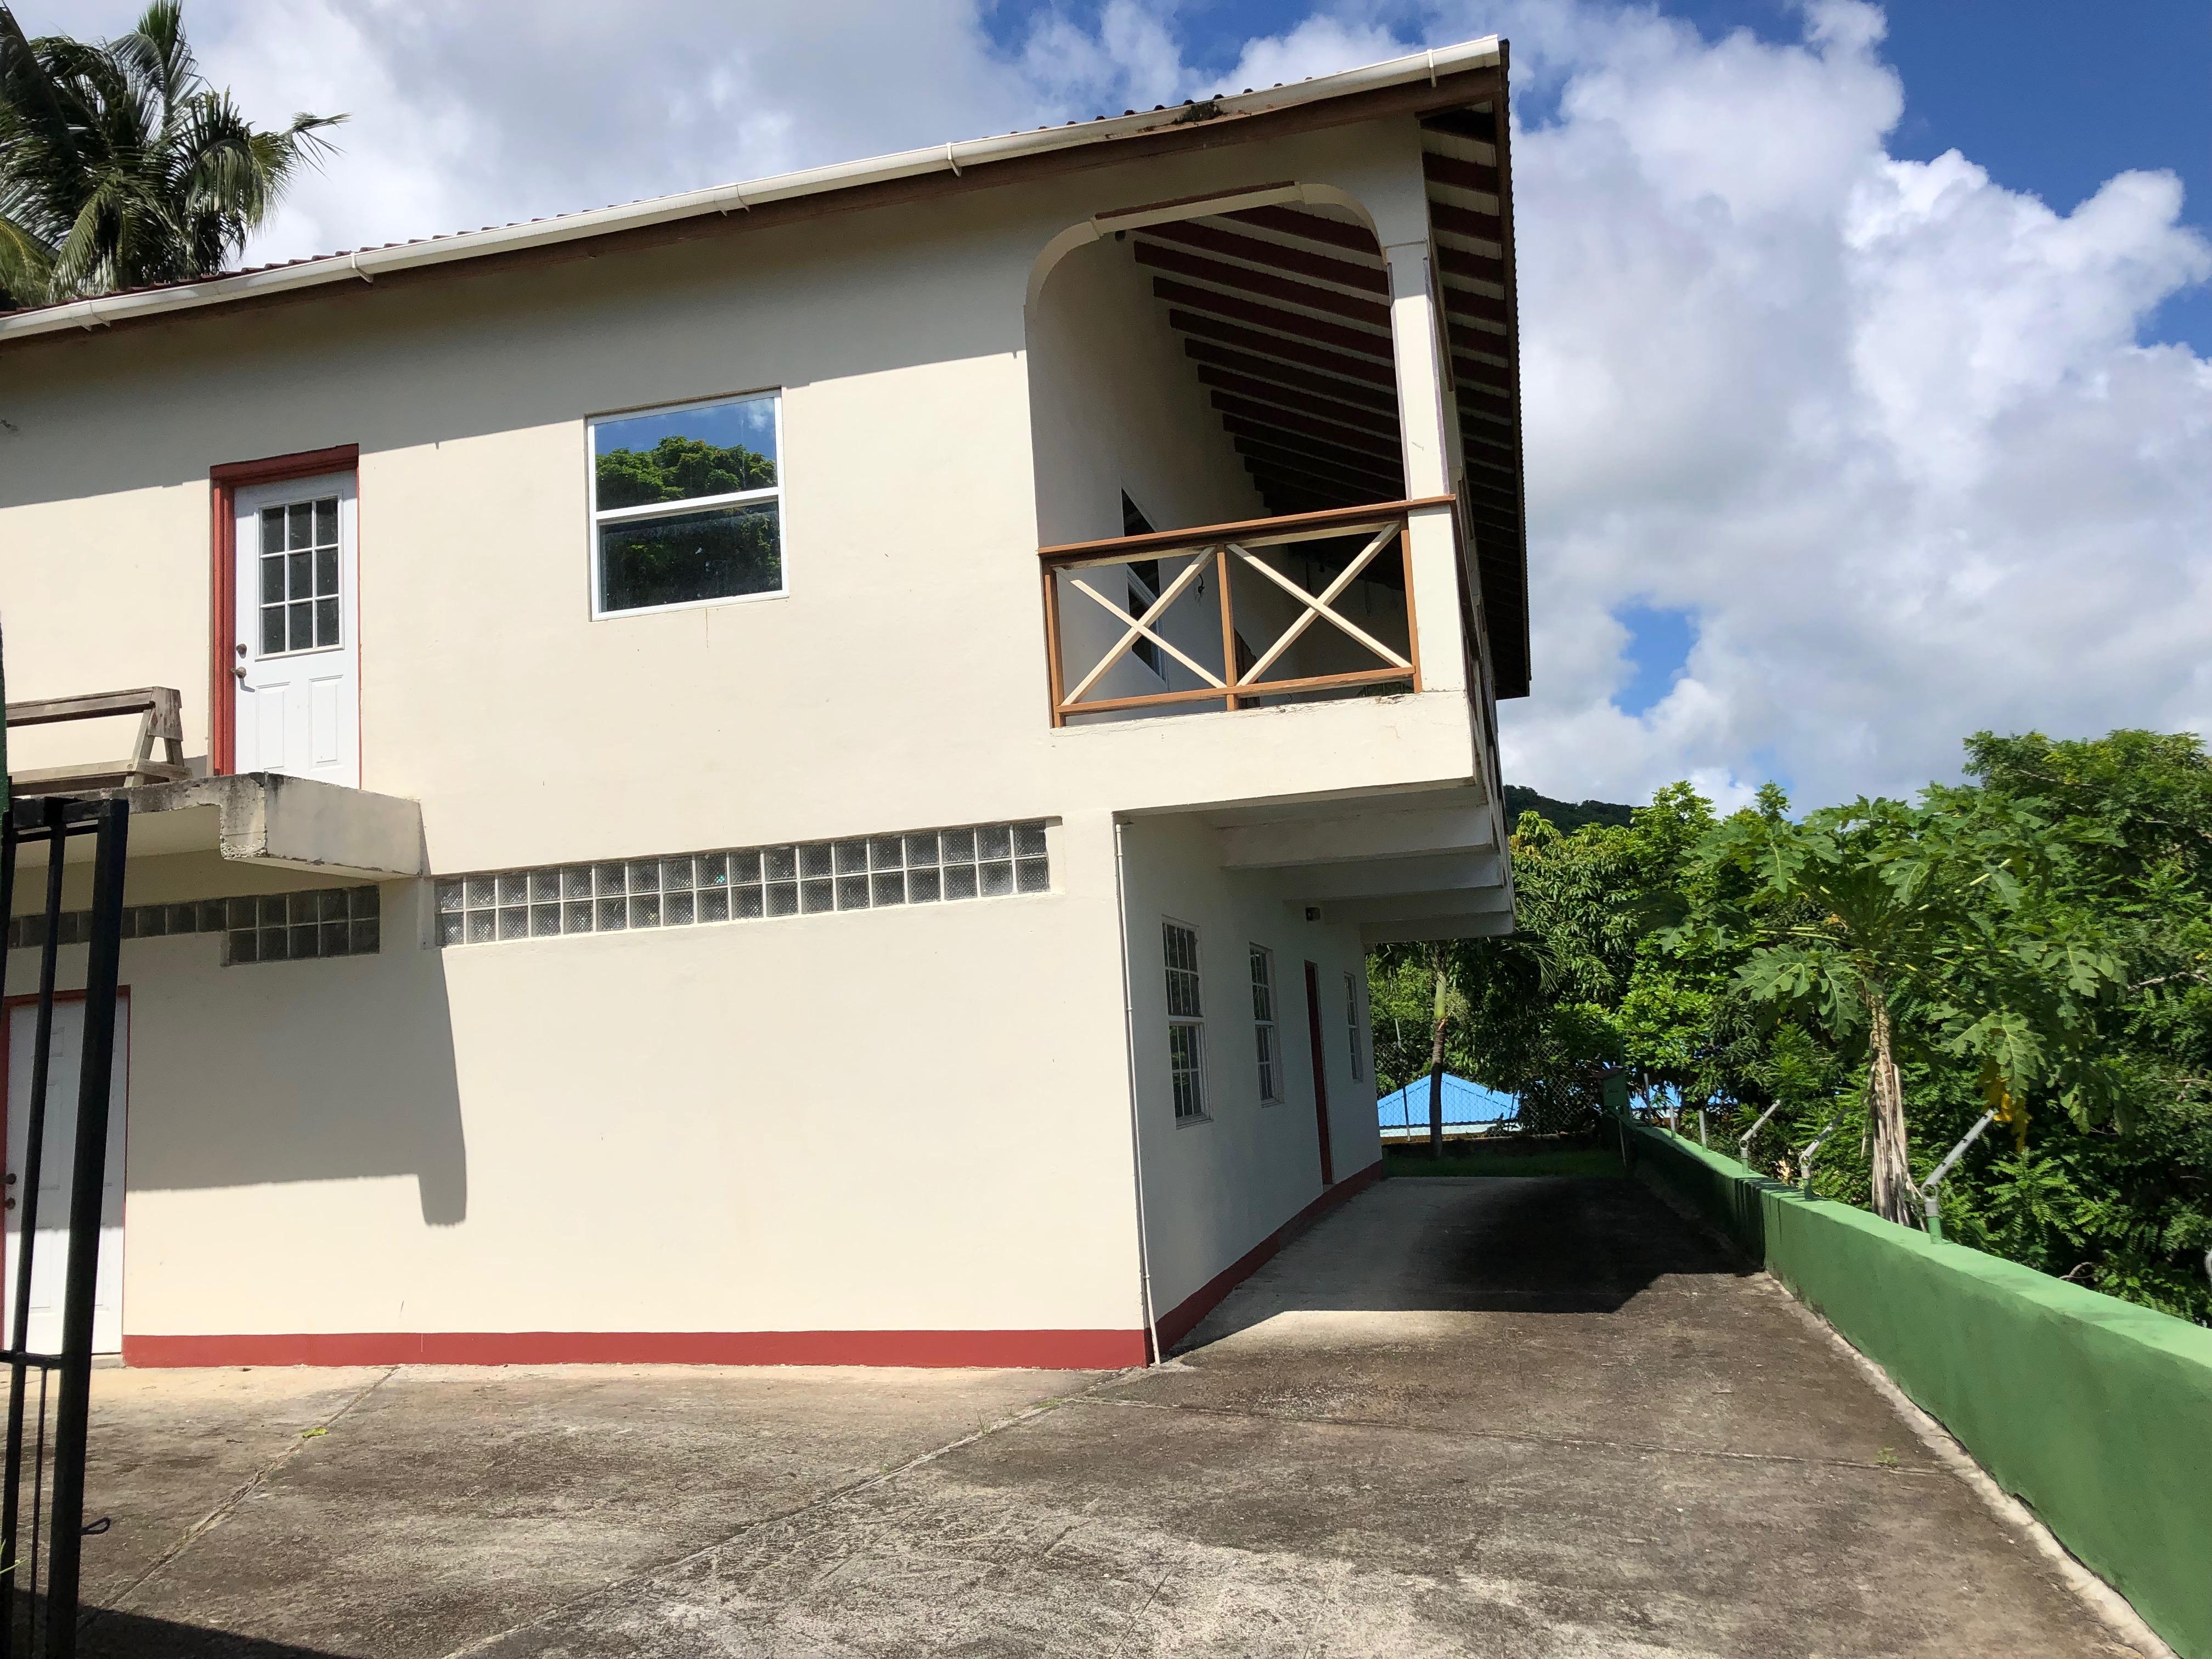 HOUSE FR SALE in laborie saint ucia caribbean